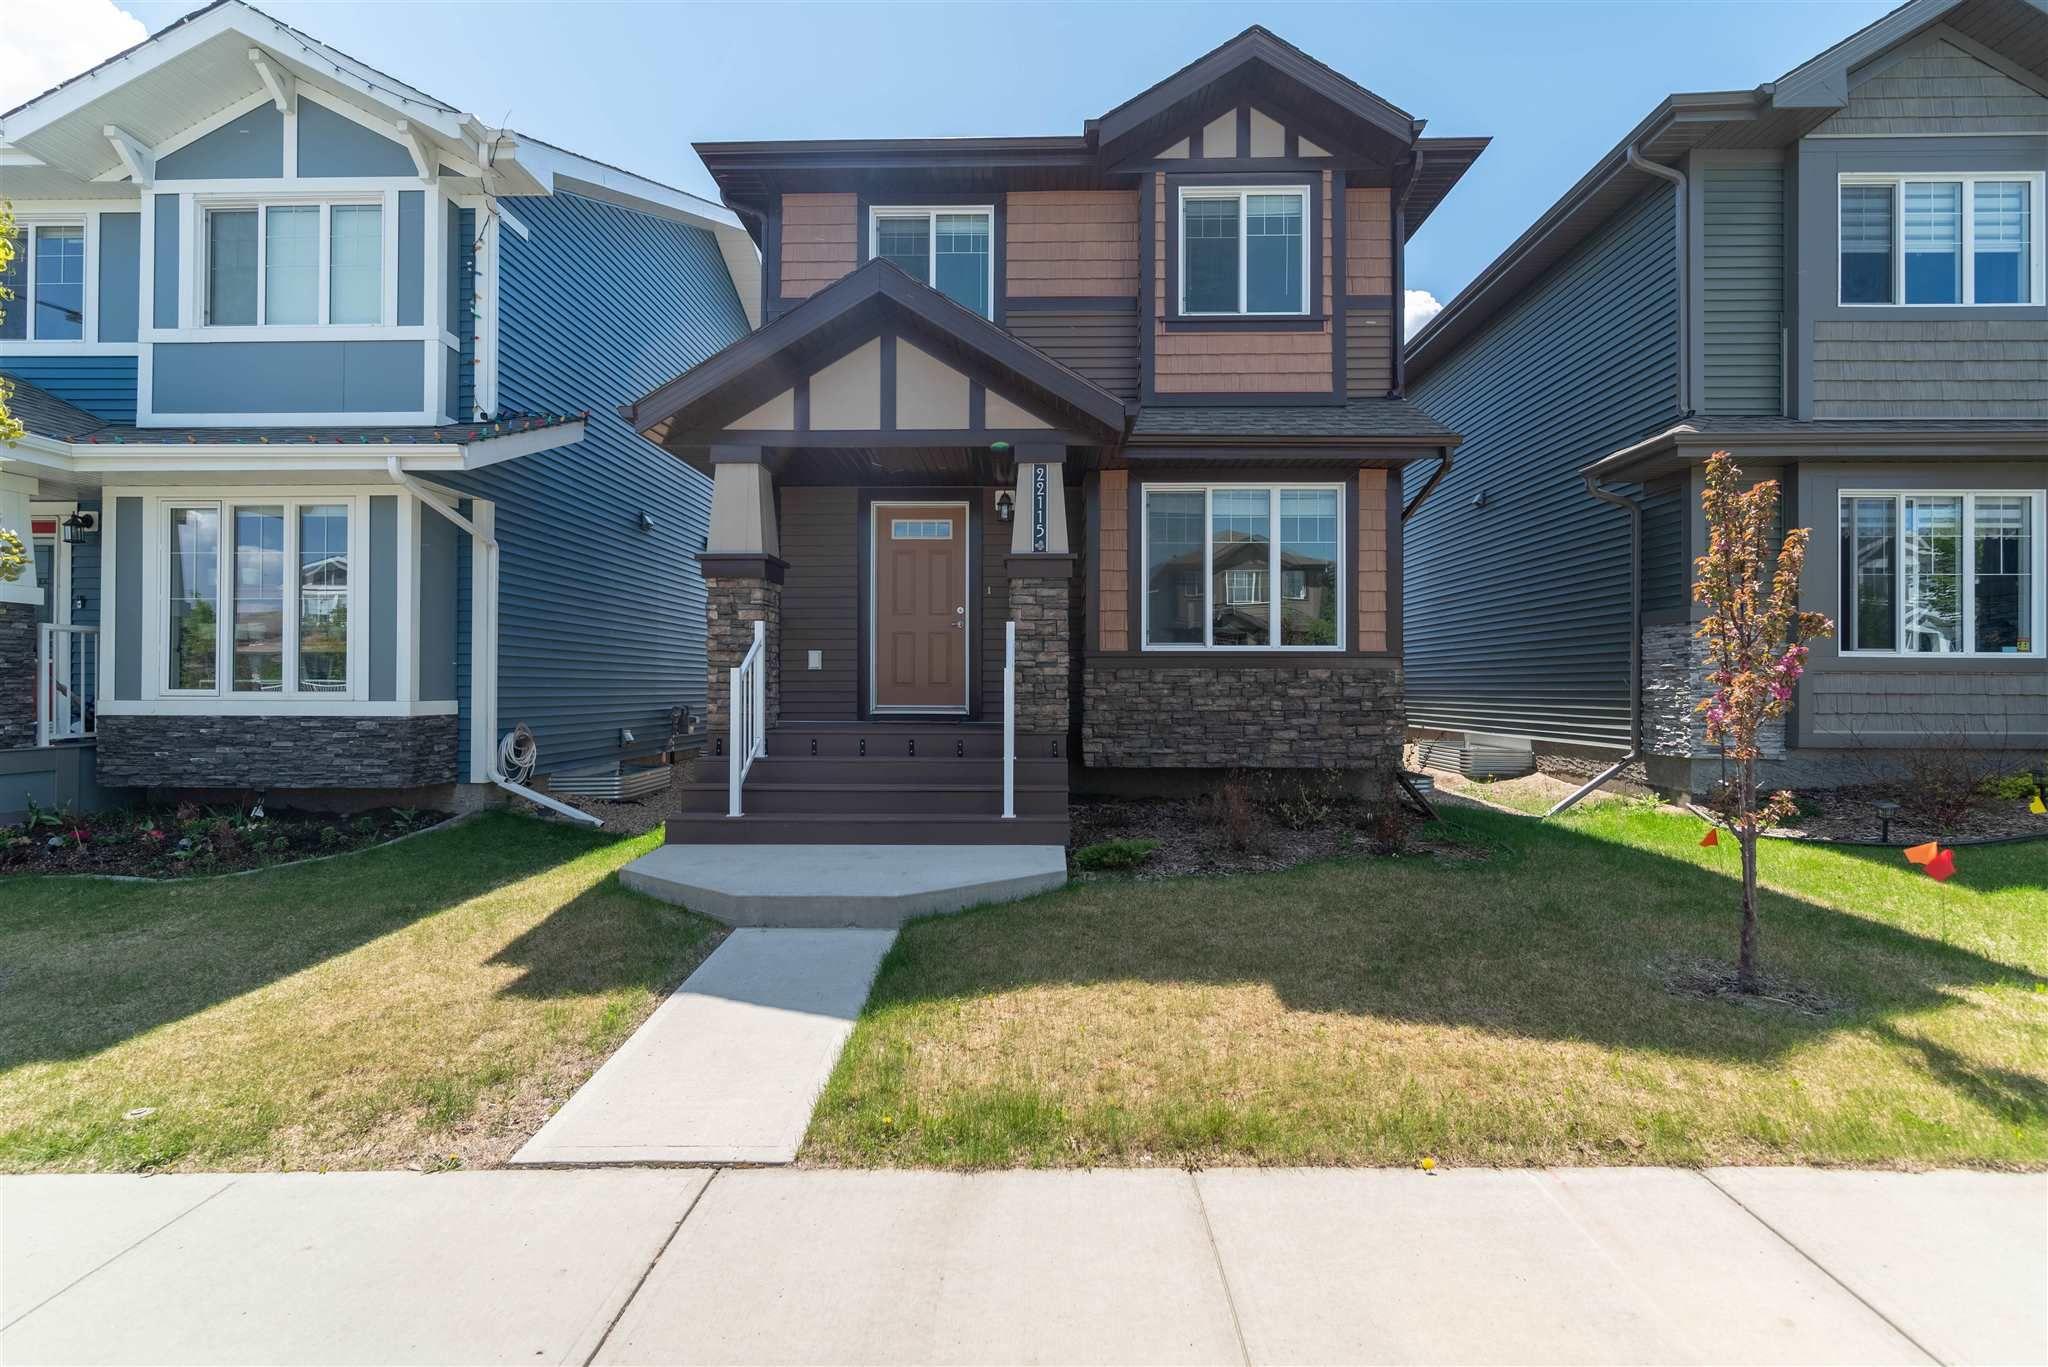 Main Photo: 22115 88 Avenue in Edmonton: Zone 58 House for sale : MLS®# E4247257